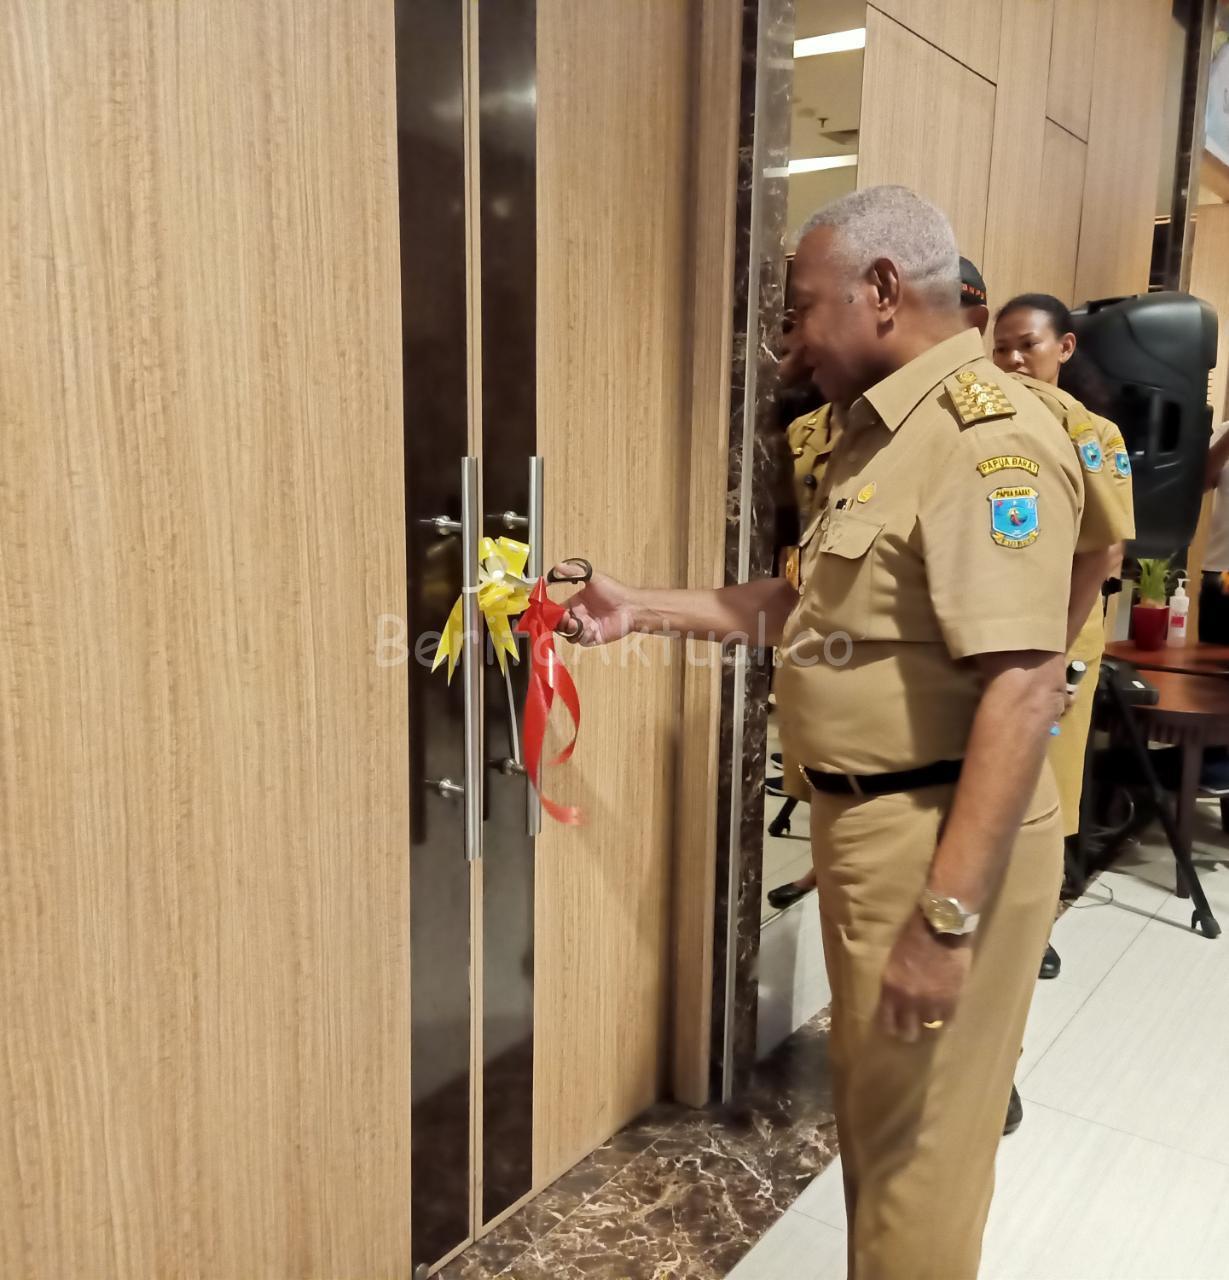 Gubernur Mandacan Nyatakan Papua Barat Siaga Darurat Virus Corona 2 IMG 20200316 WA0016